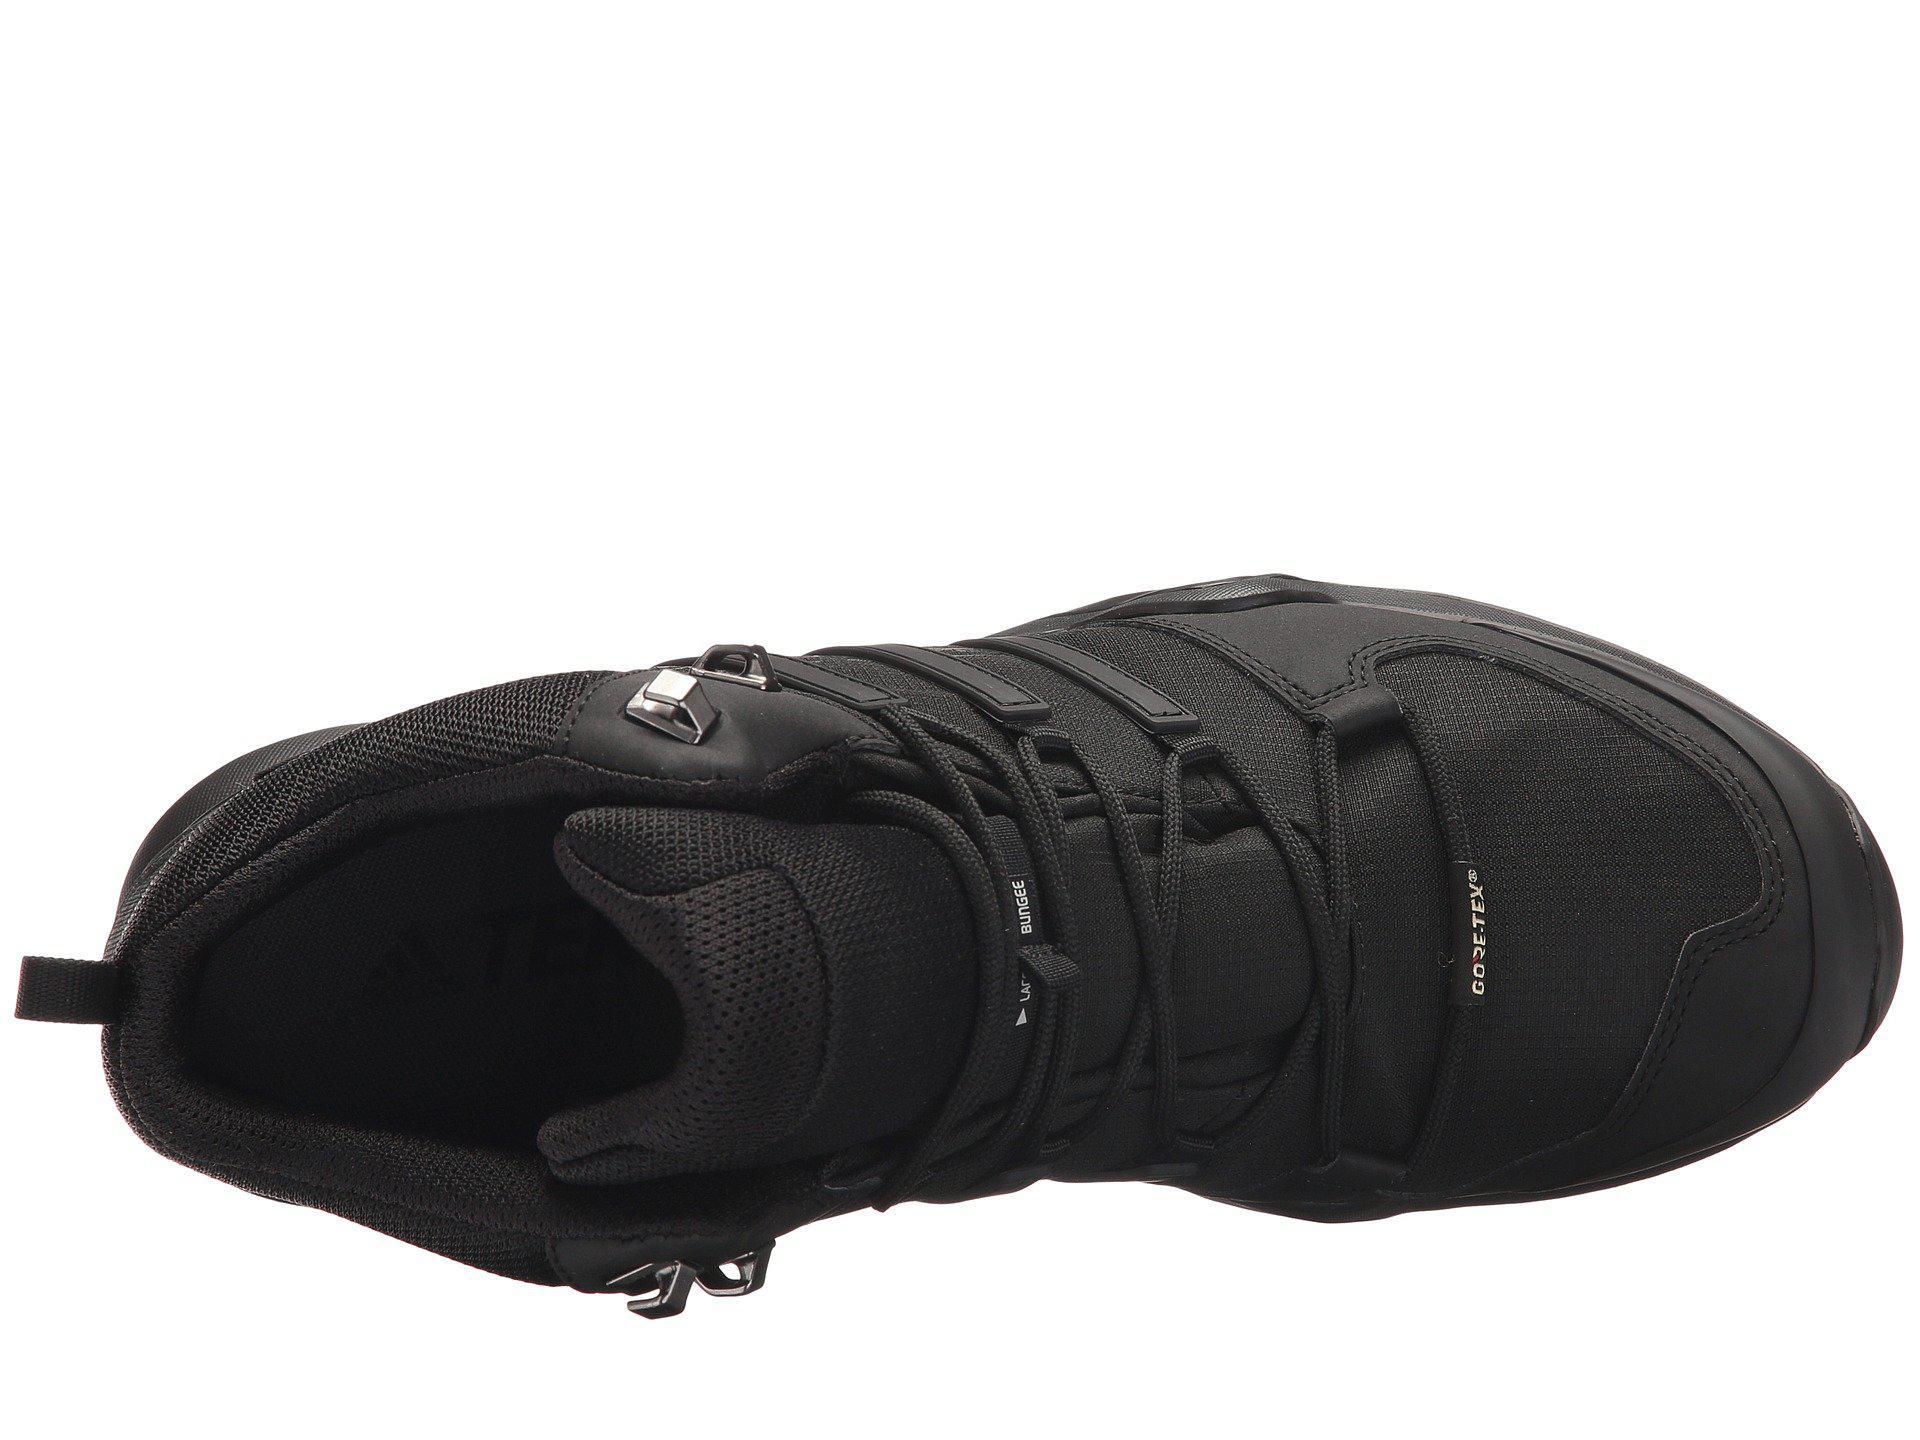 8529a1628 Adidas Originals - Terrex Swift R2 Mid Gtx(r) (black black . View fullscreen